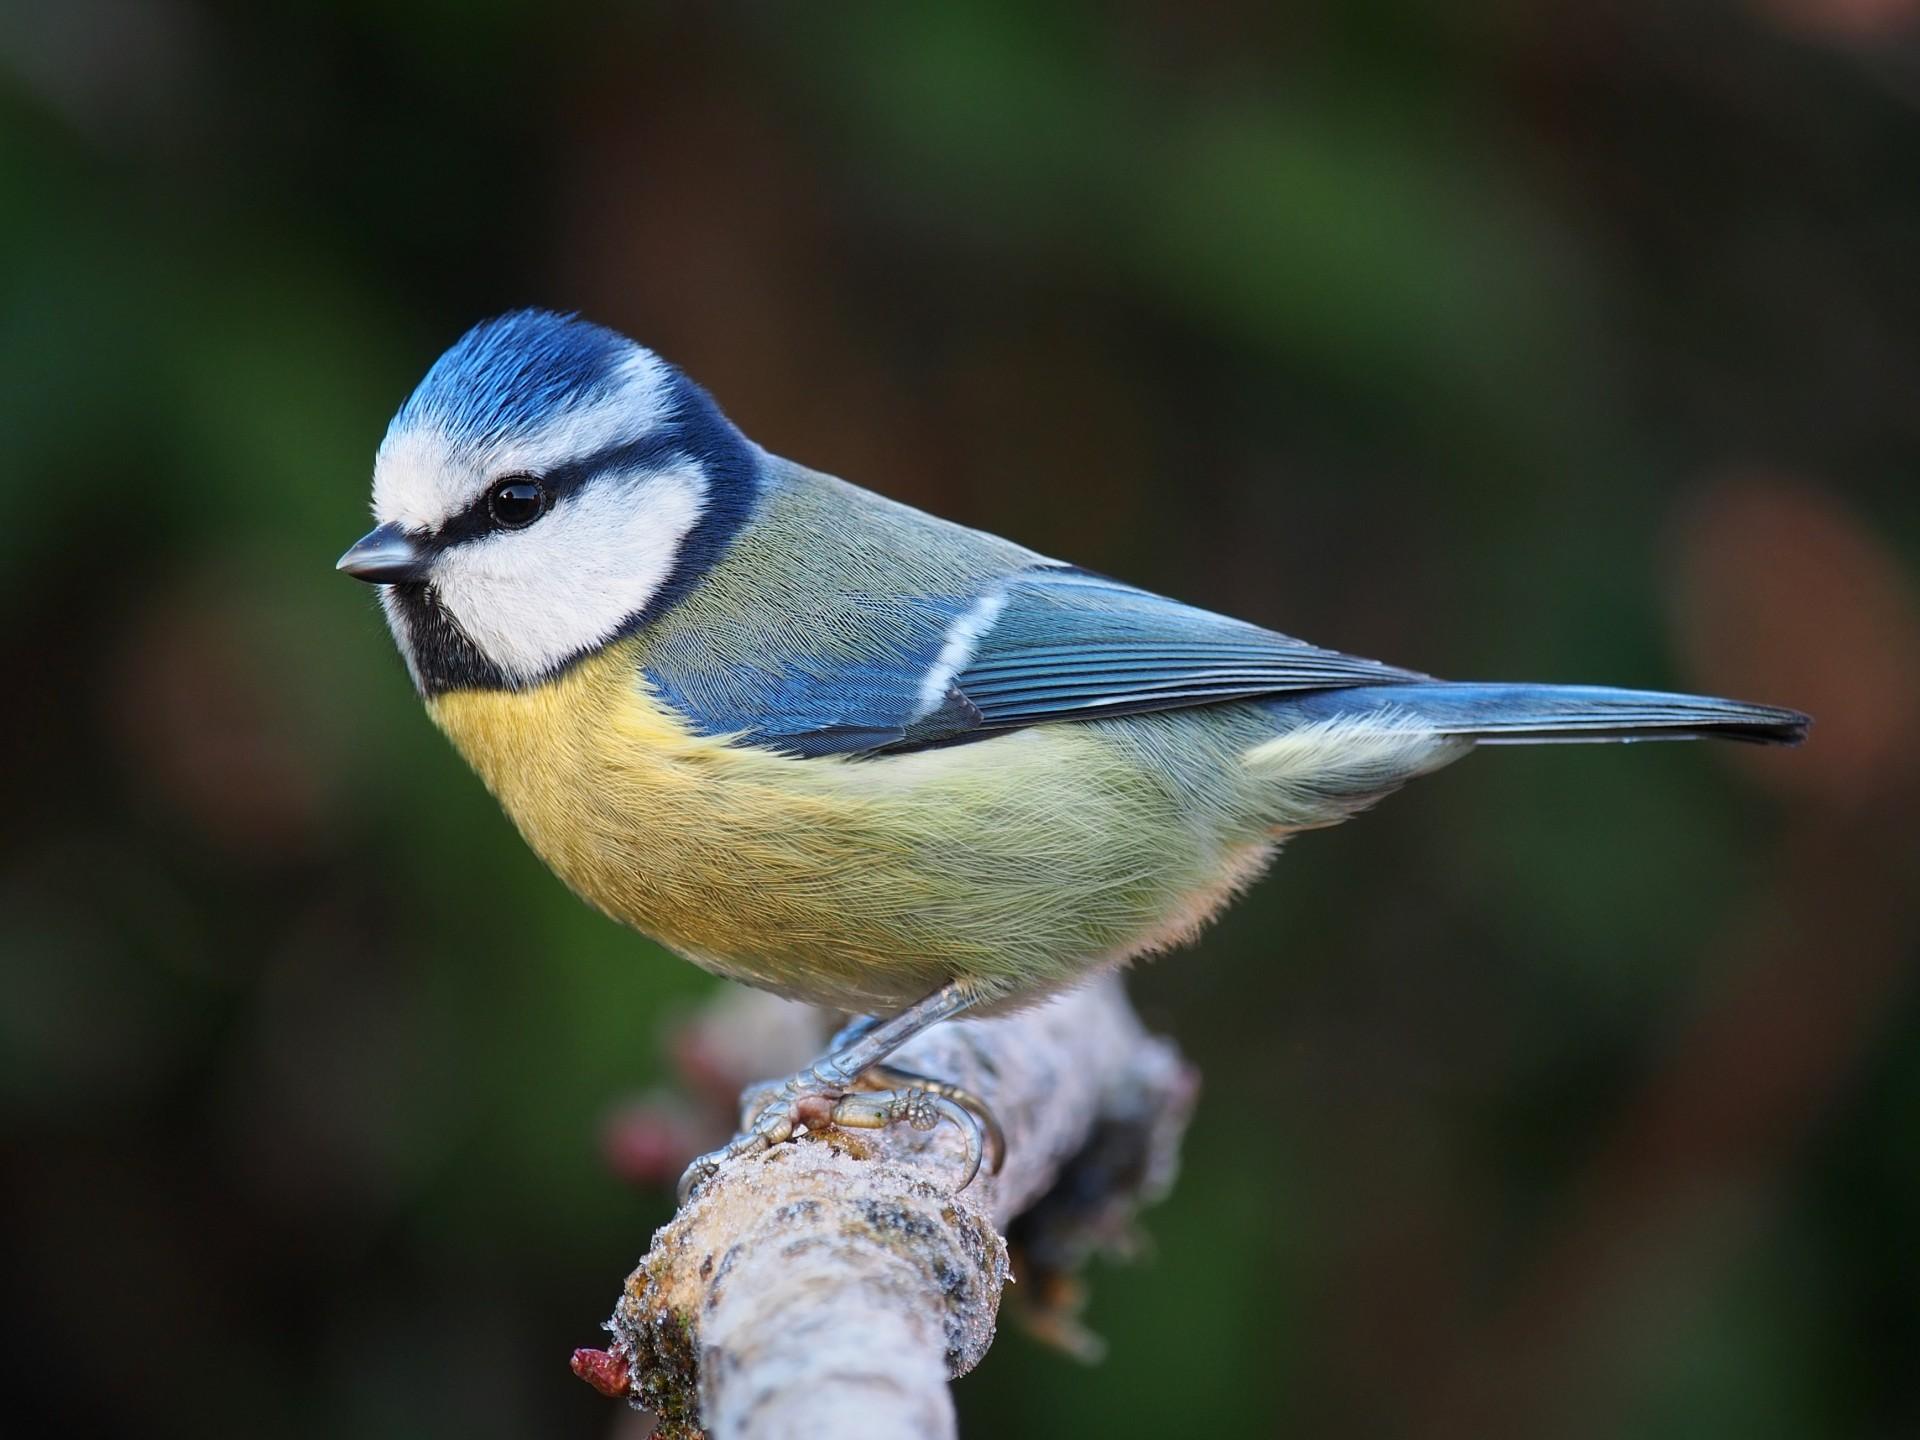 Chapim Azul | Chamamento de Aves